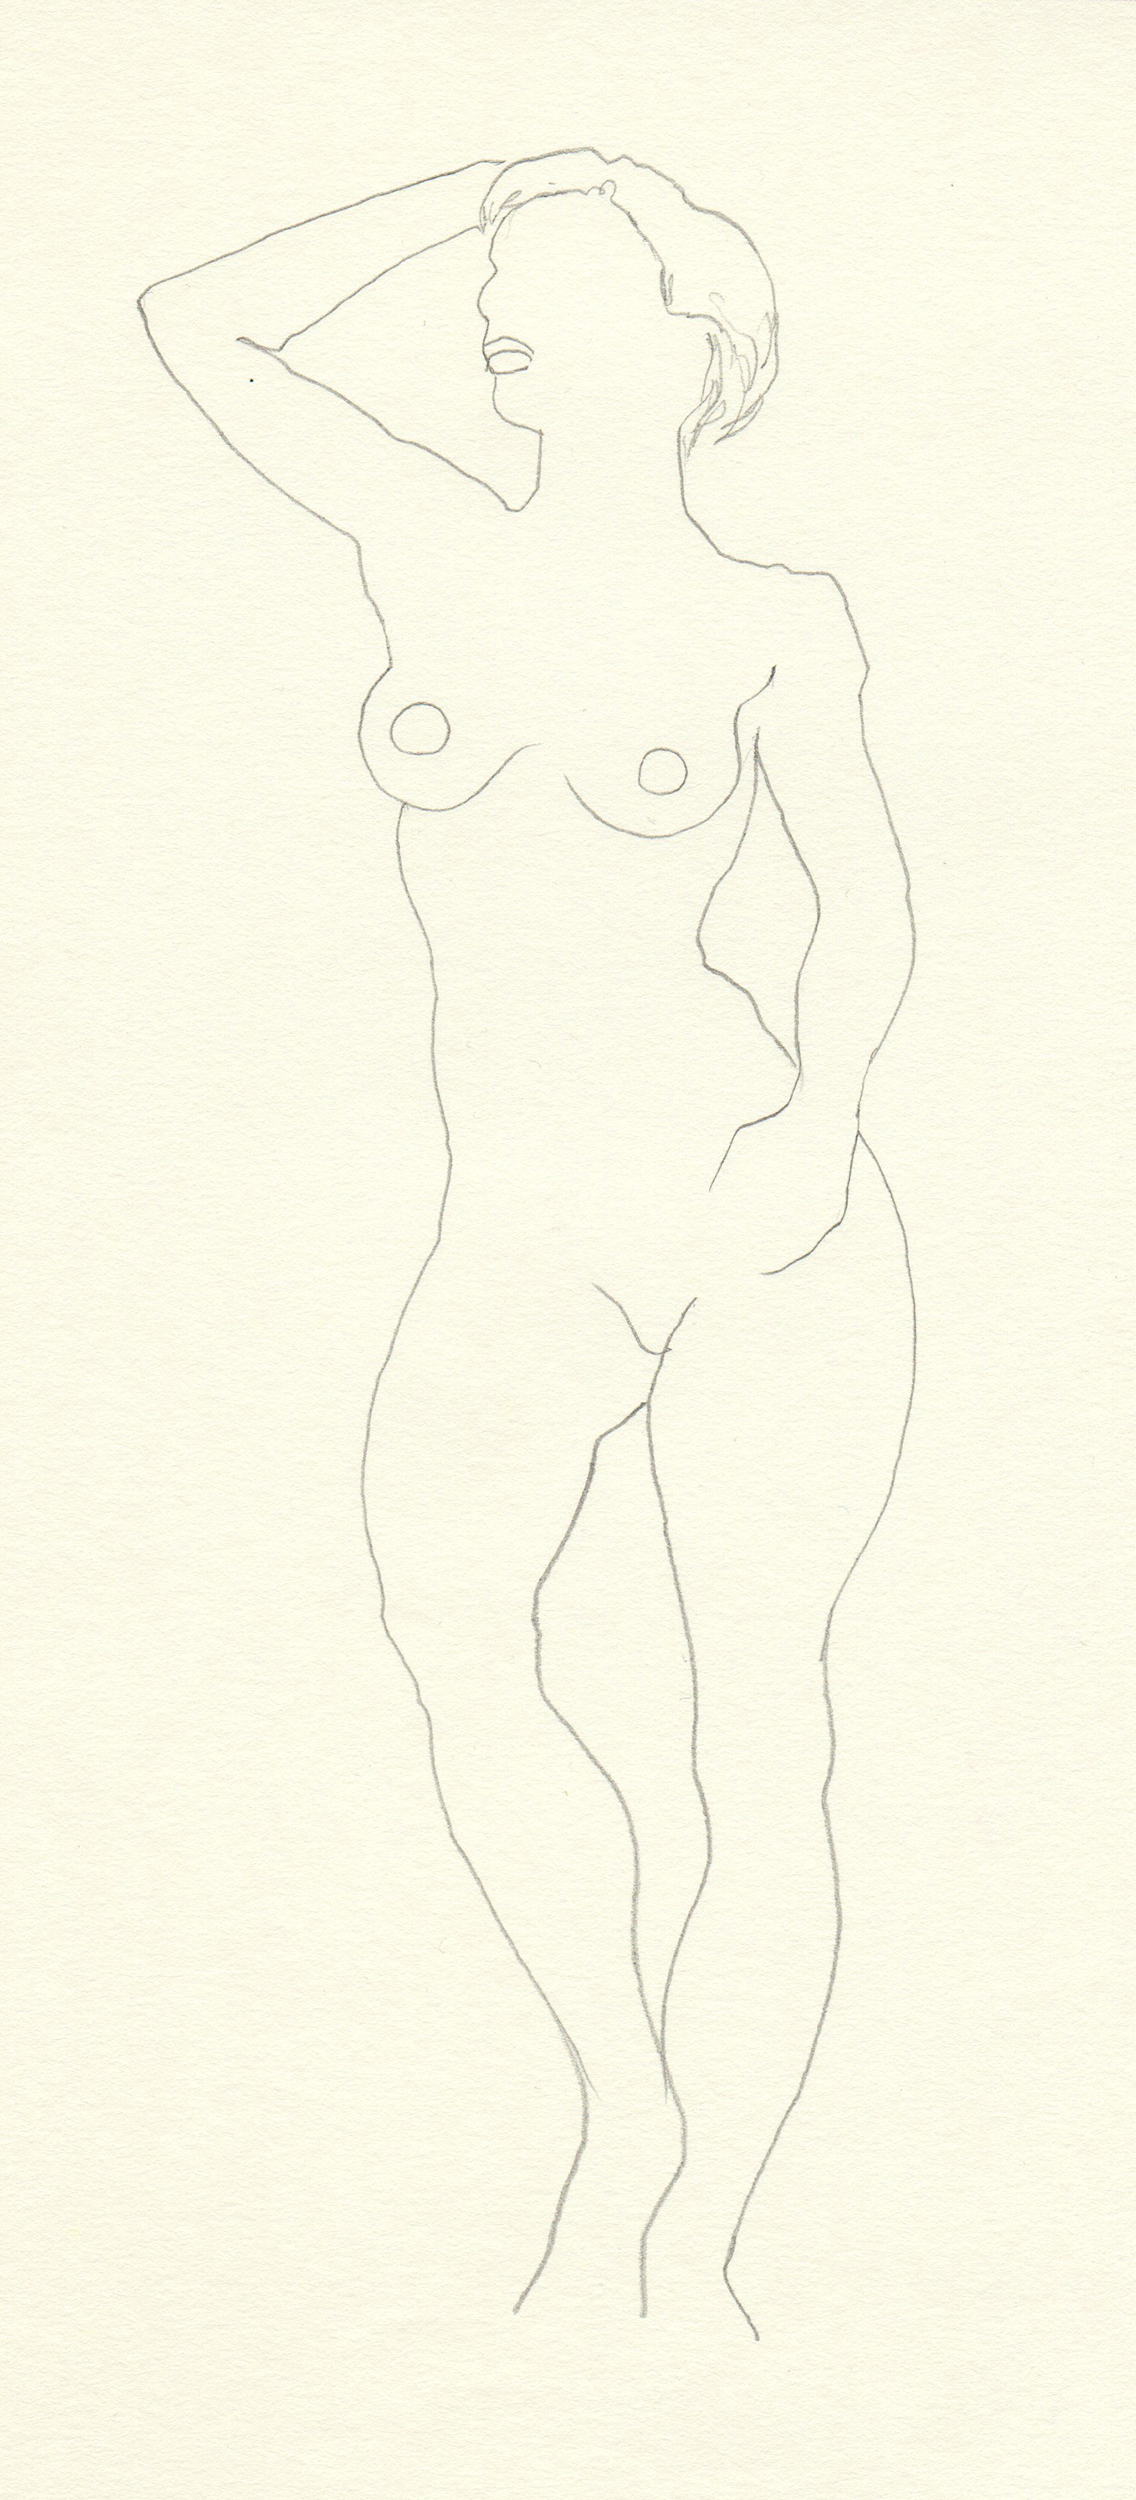 2012_Sketch_F-Beudin_067